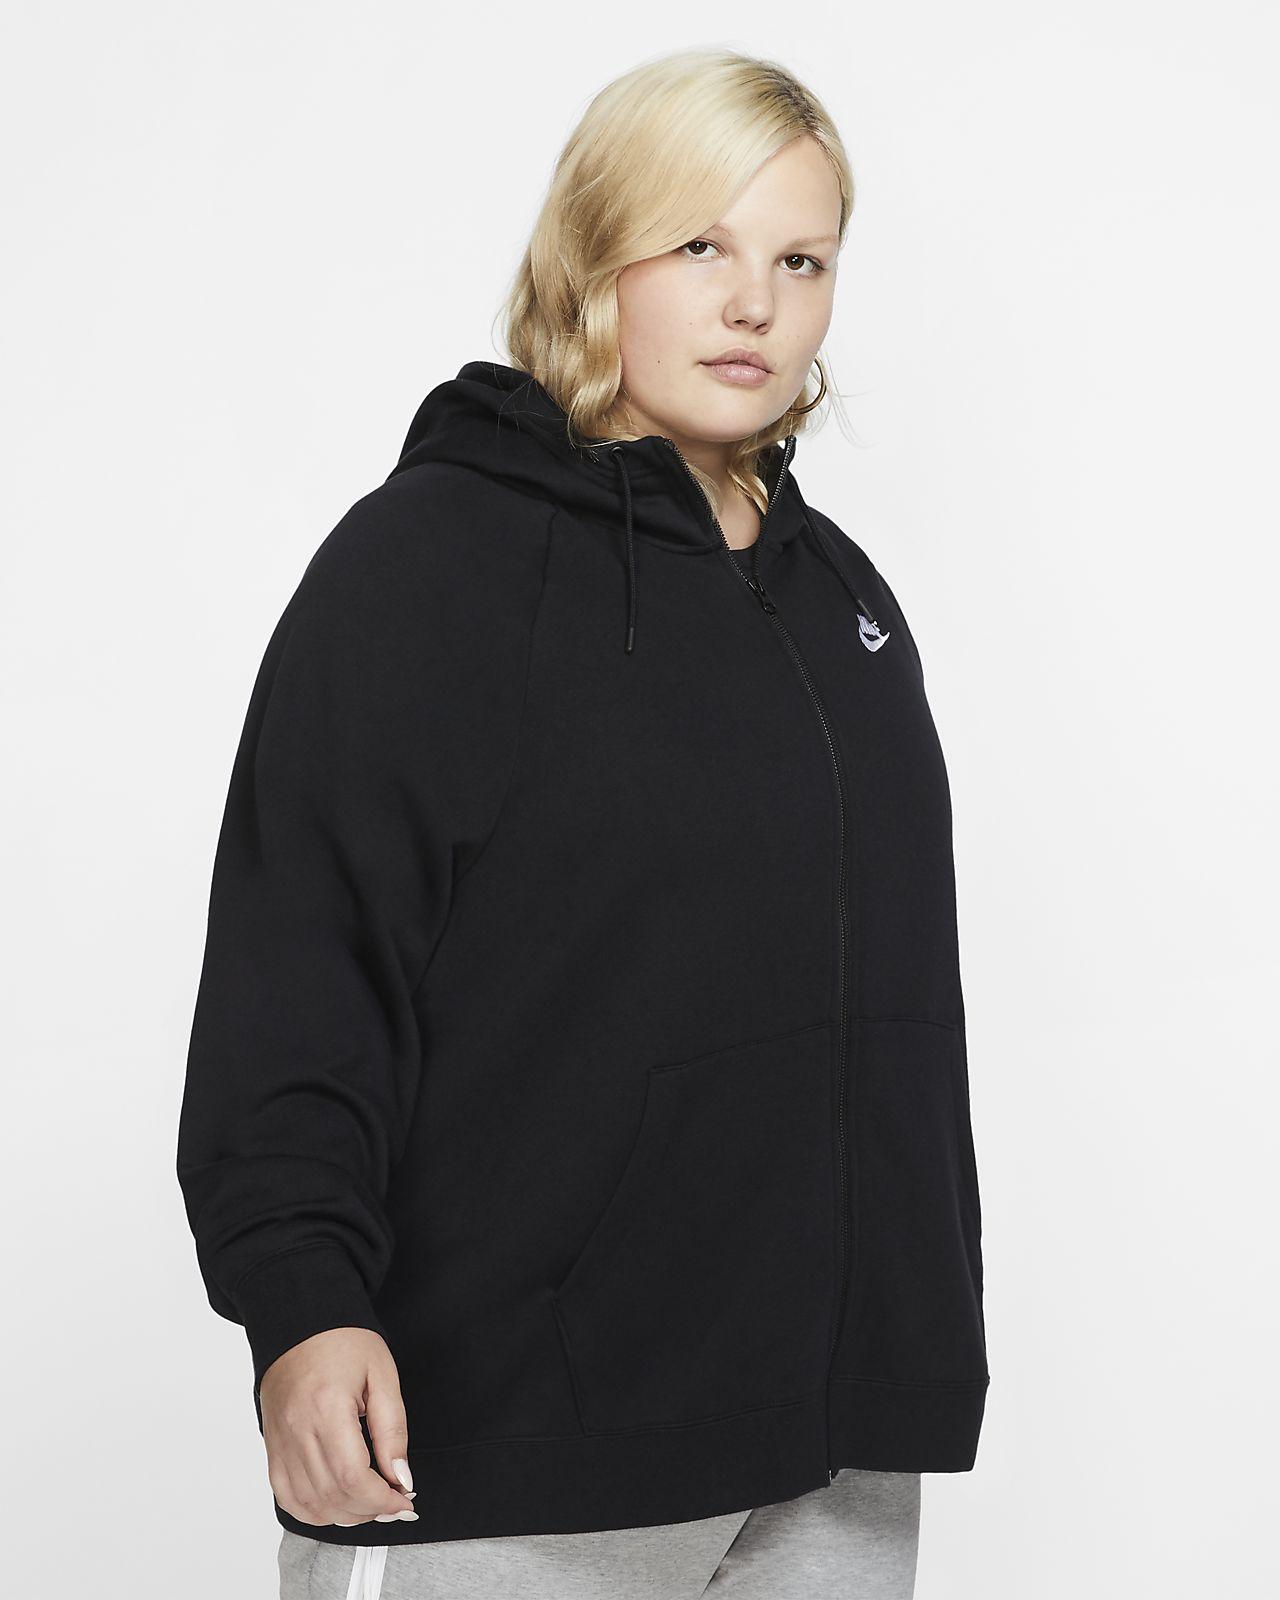 Sudadera con capucha de cierre completo para mujer Nike Sportswear Essential (talla grande)